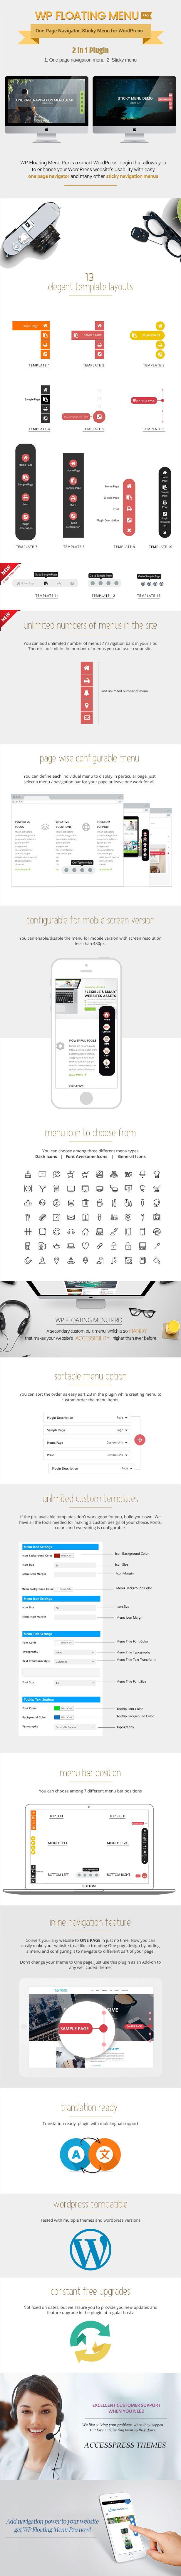 WP Floating Menu Pro - One page navigator, sticky menu for WordPress by AccessKeys